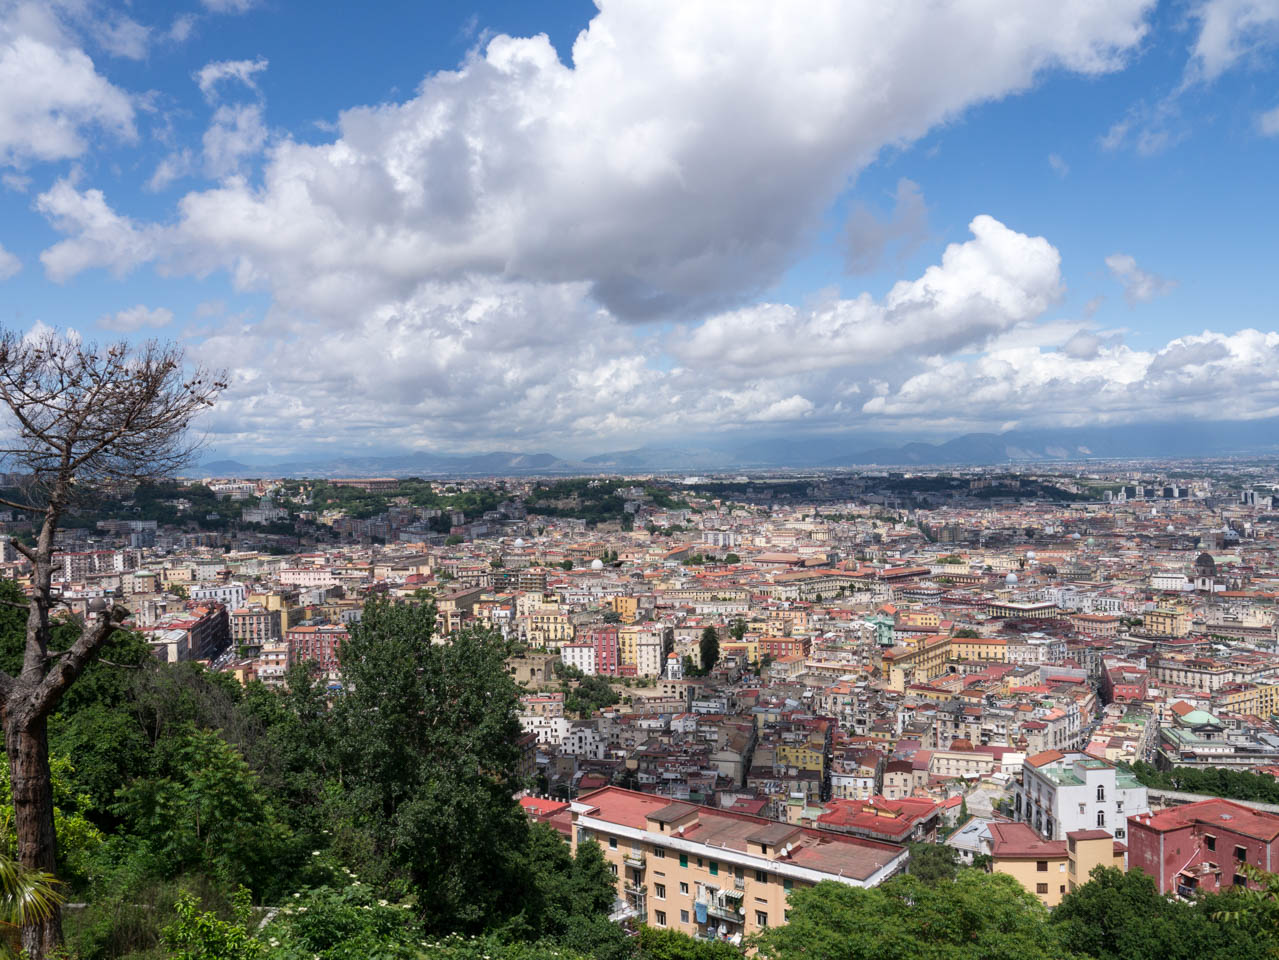 Neapels Häusermeer (1 von 1)